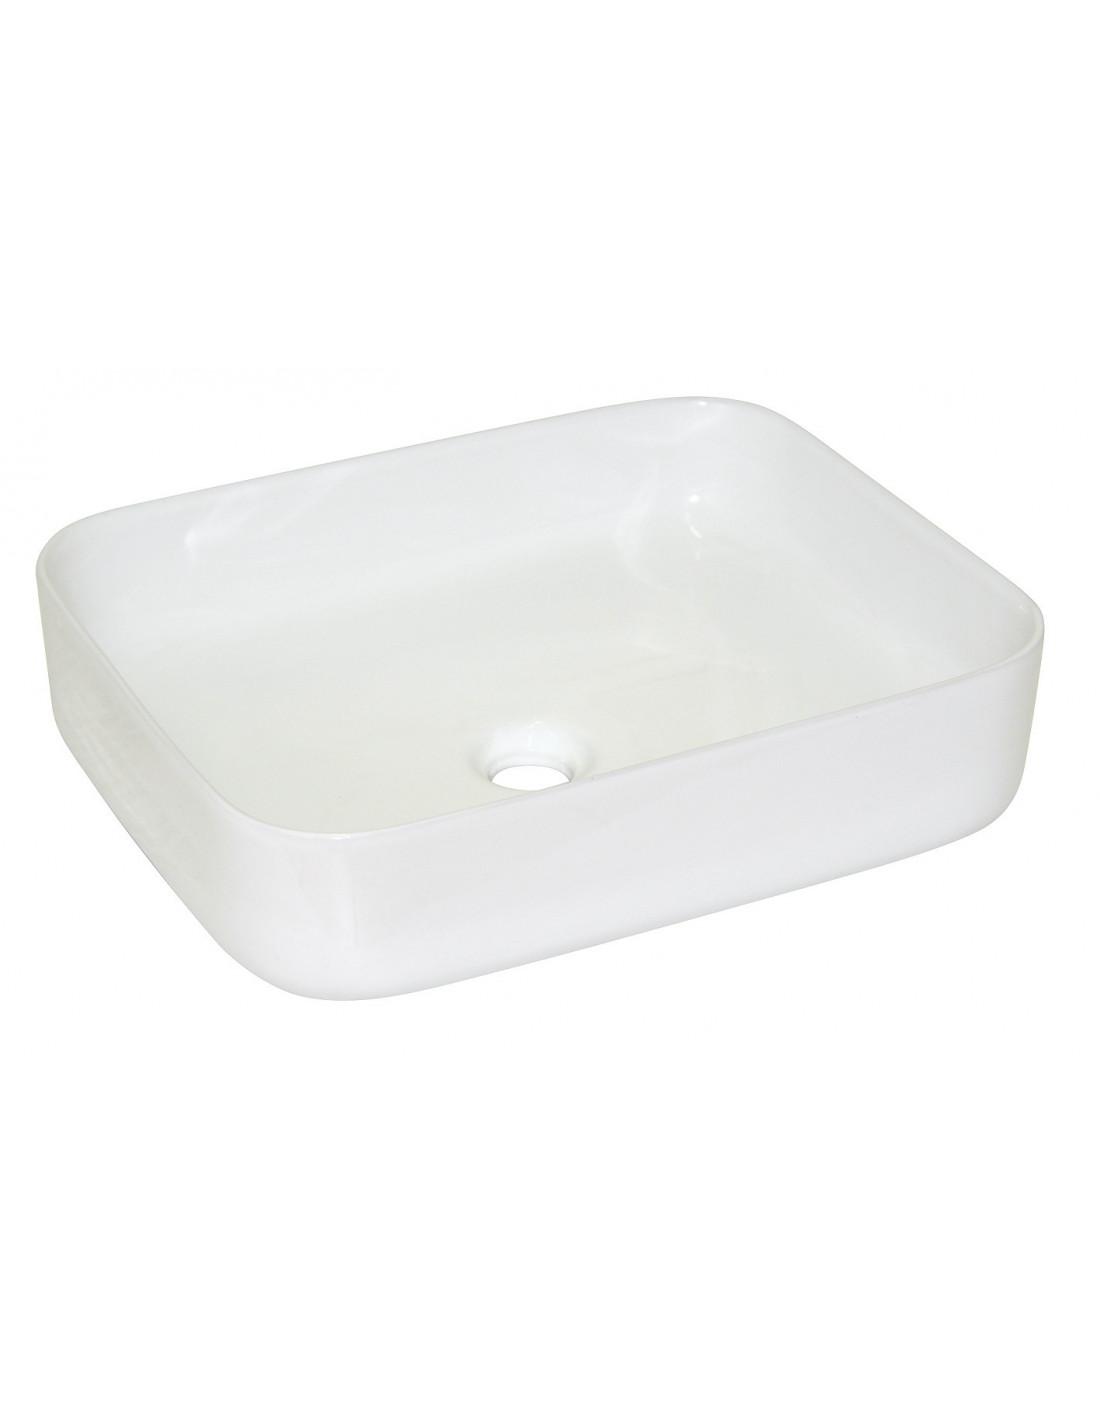 vasque a poser ceramique MARKET Vasque à poser céramique blanche 54 x 40 cm